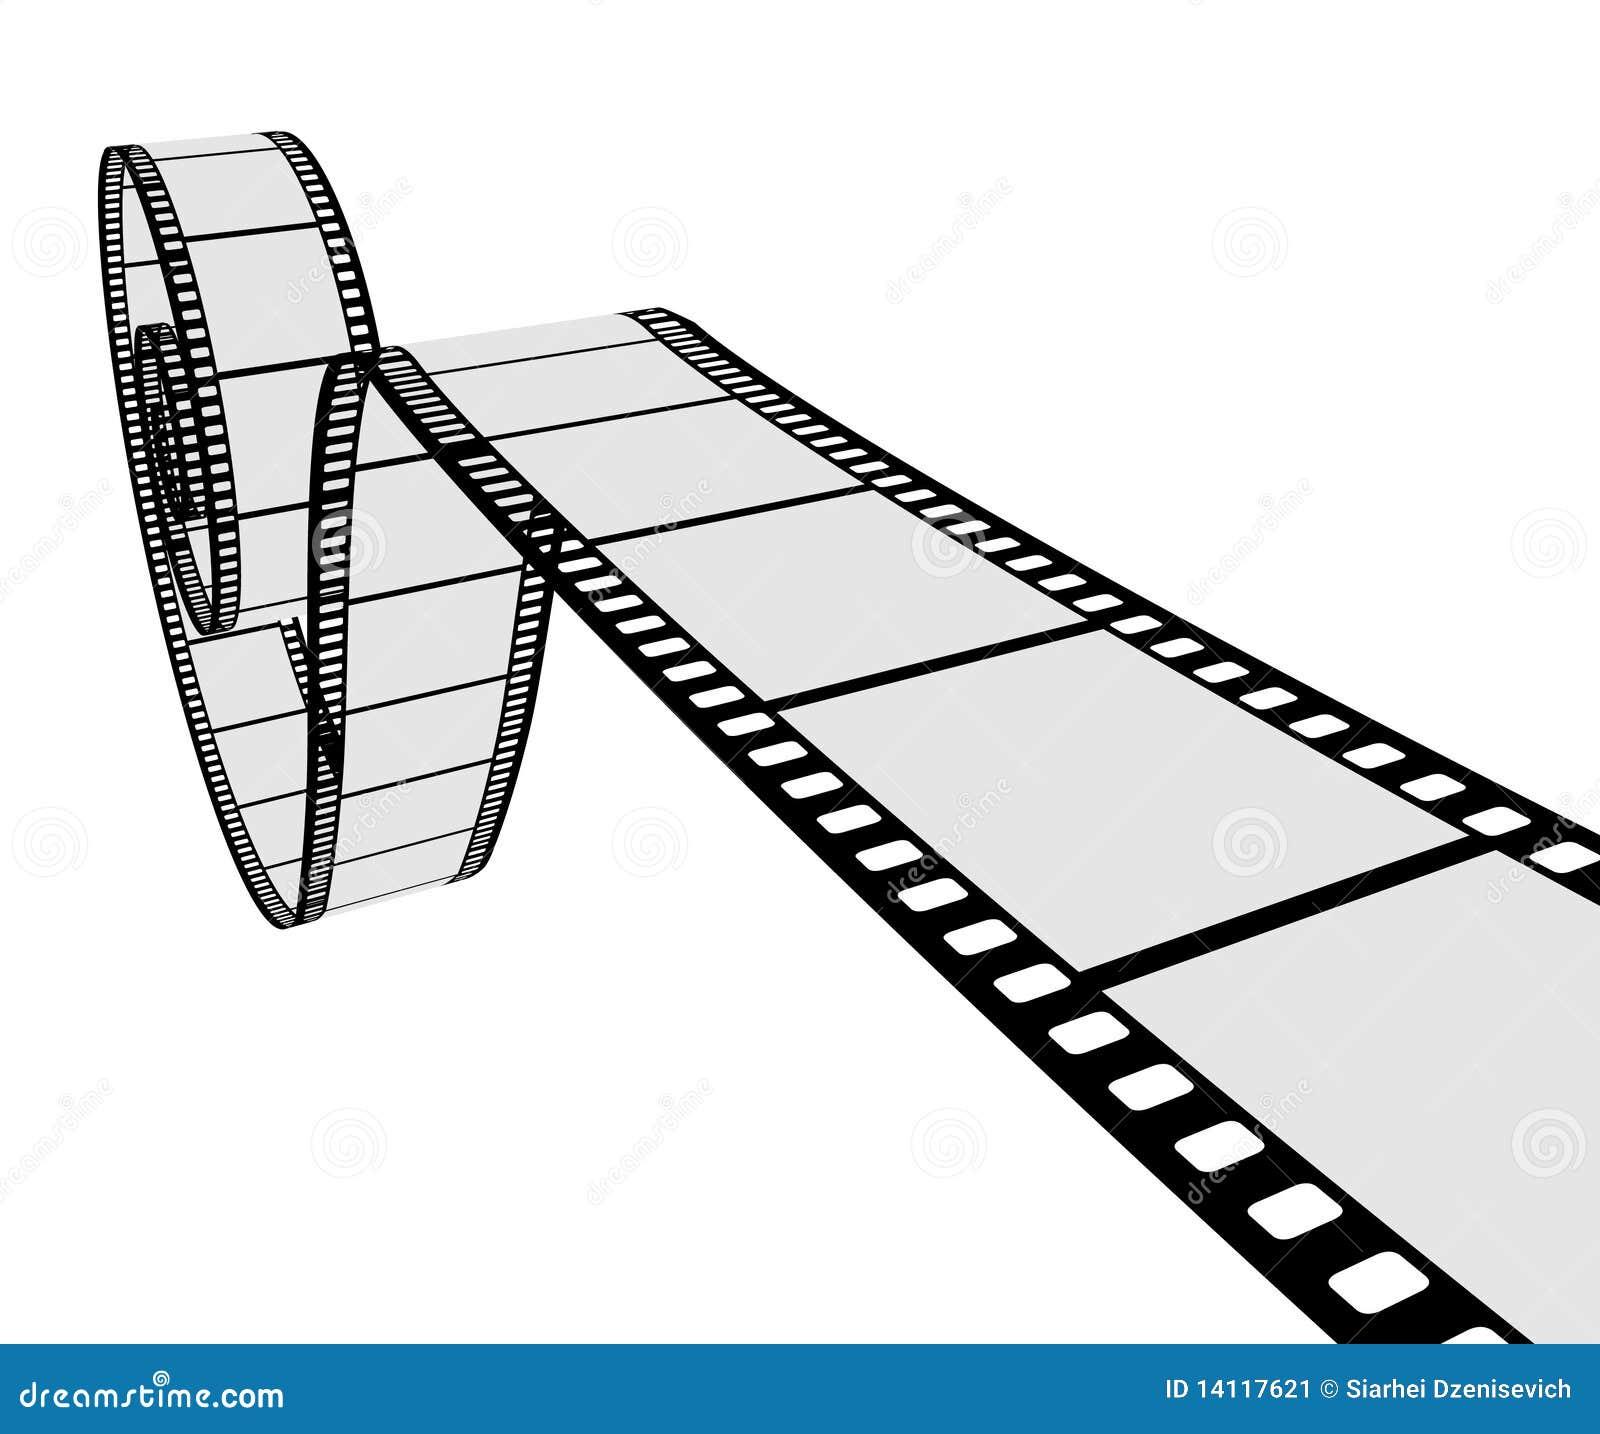 clipart pellicola cinematografica - photo #8